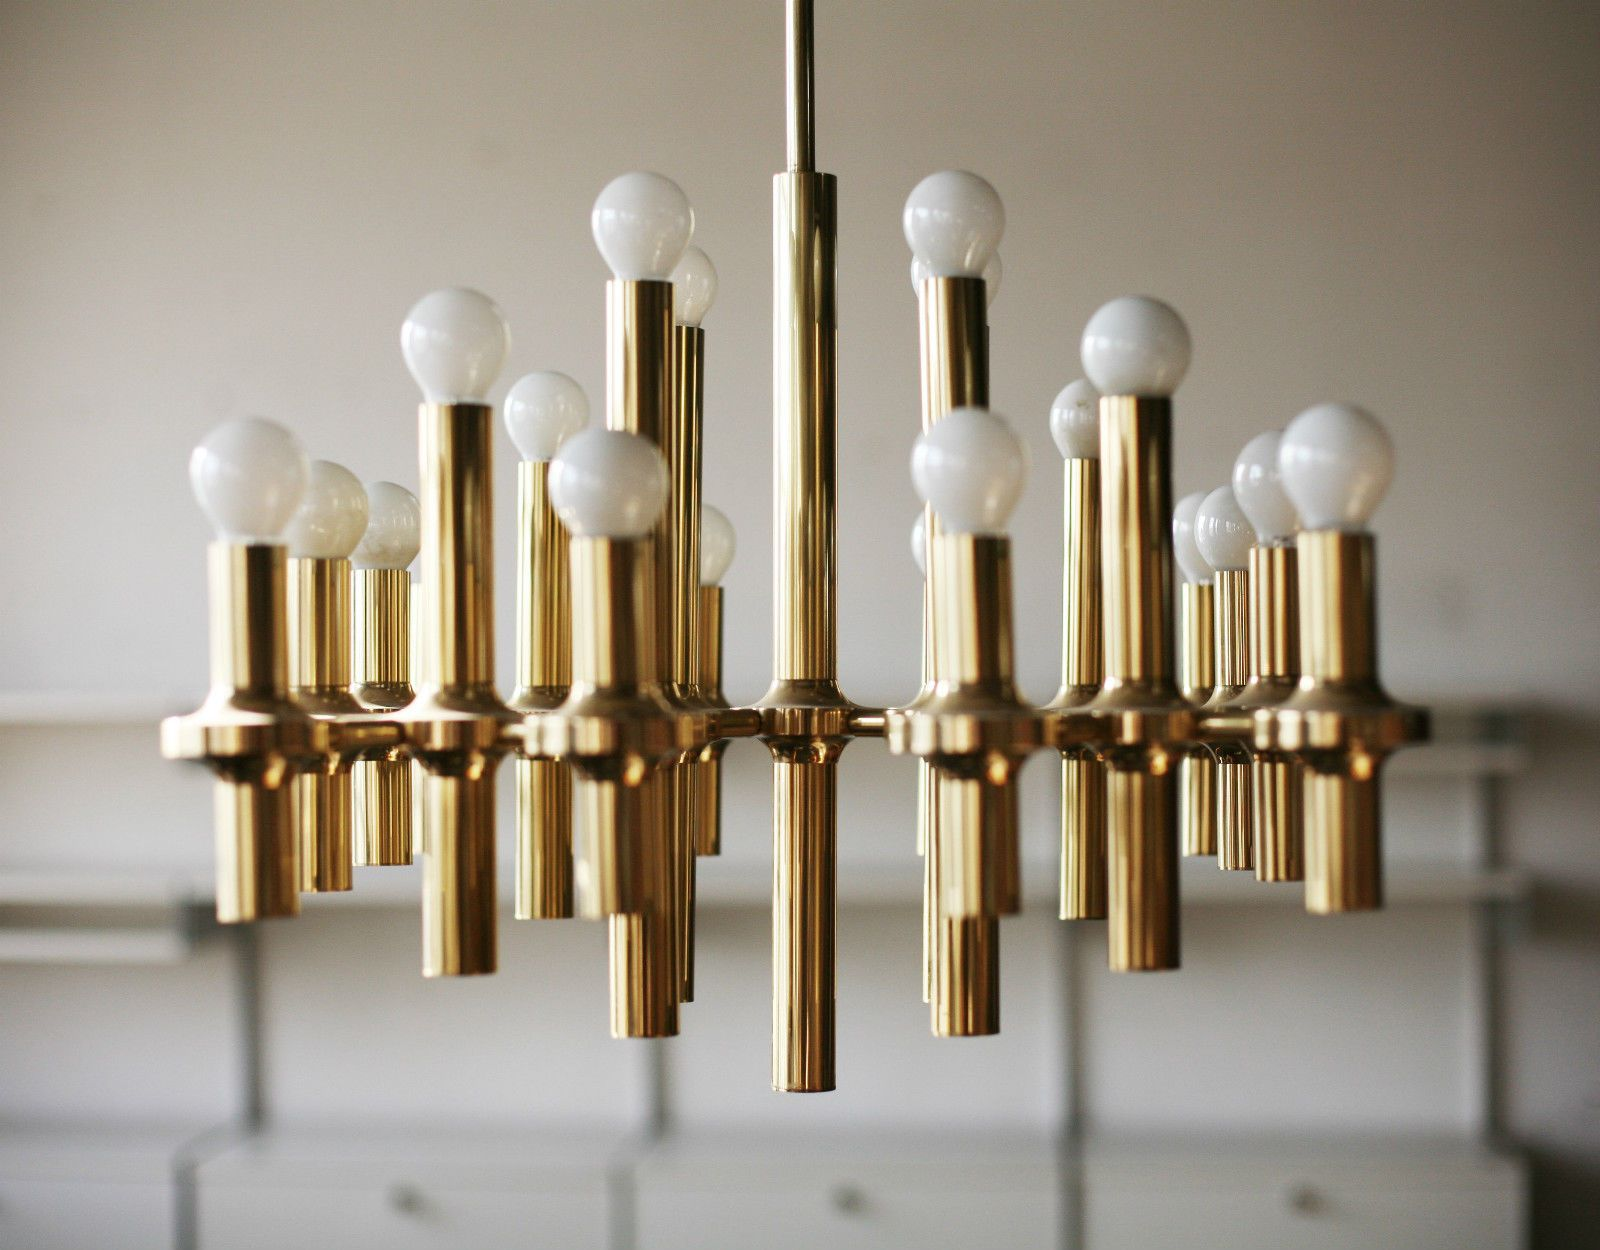 true vintage gaetano sciolari deckenlampe 70er lampe space age chandelier gold large sciolari. Black Bedroom Furniture Sets. Home Design Ideas